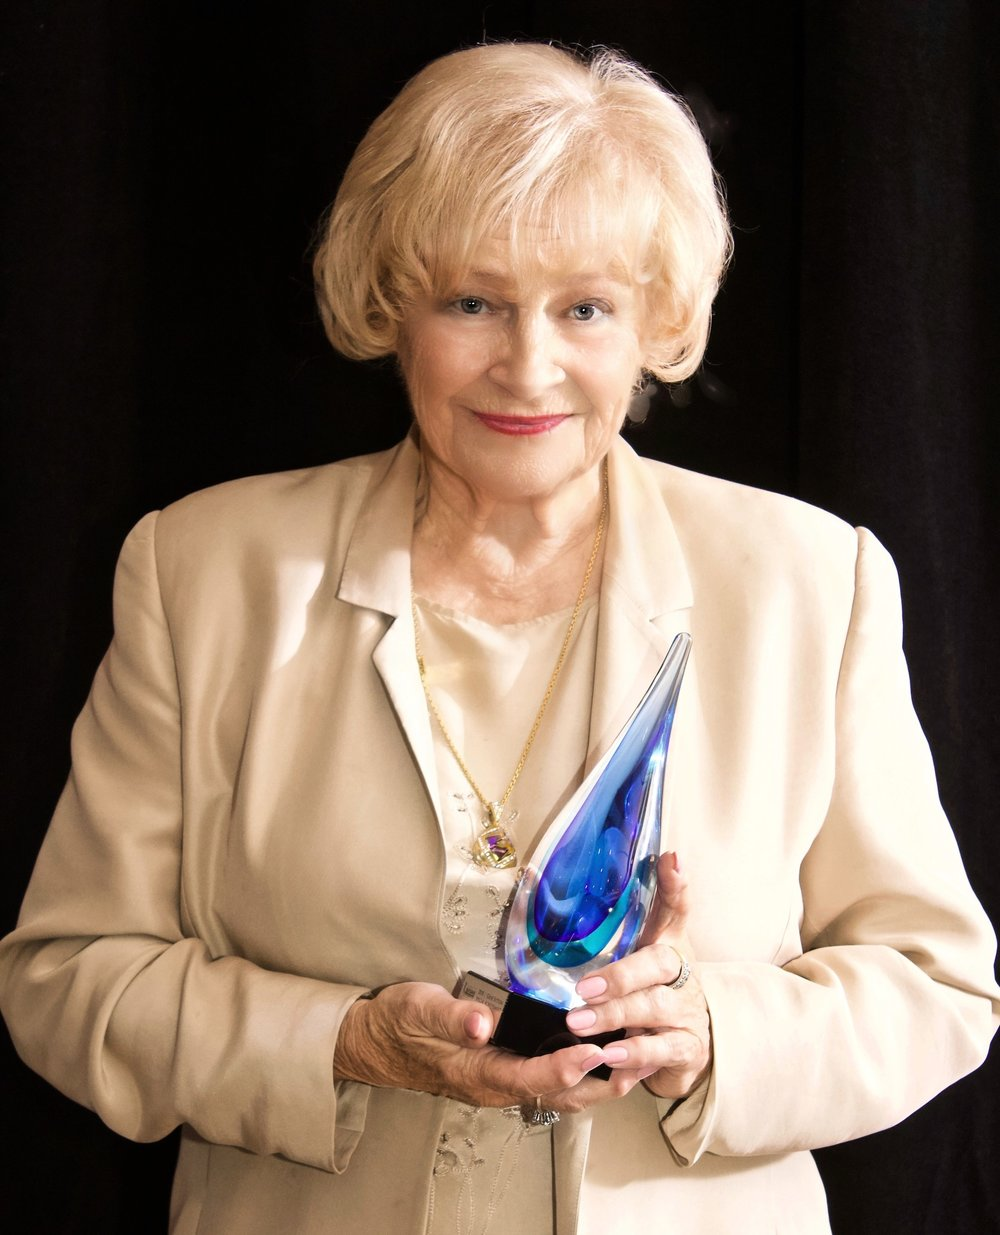 Evelyn with award.jpeg